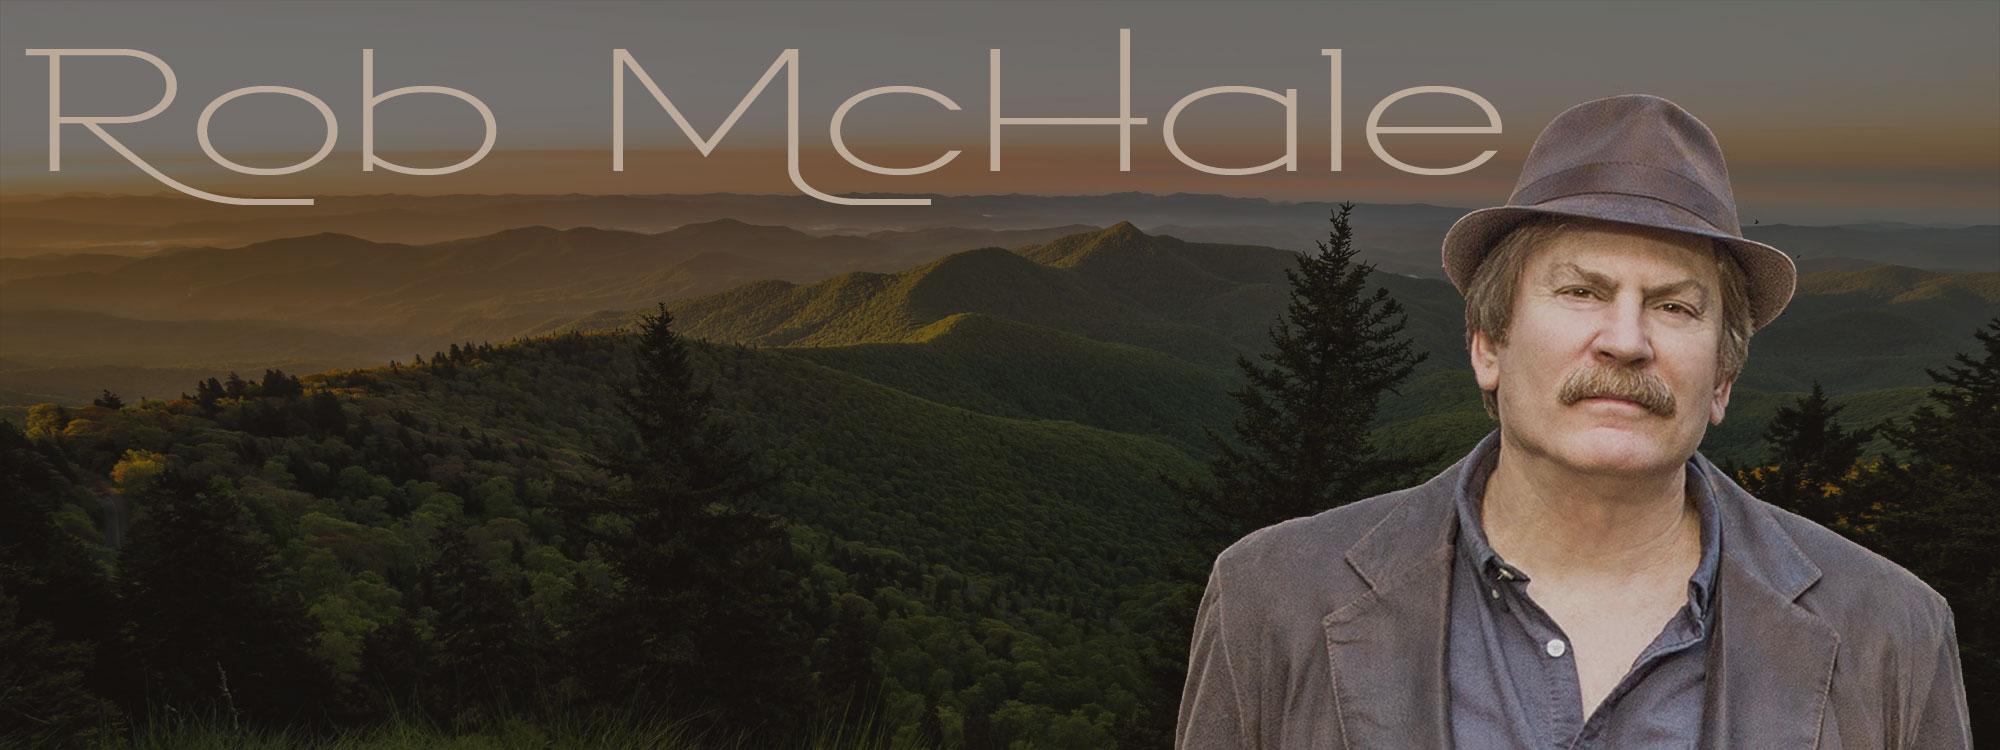 Rob McHale